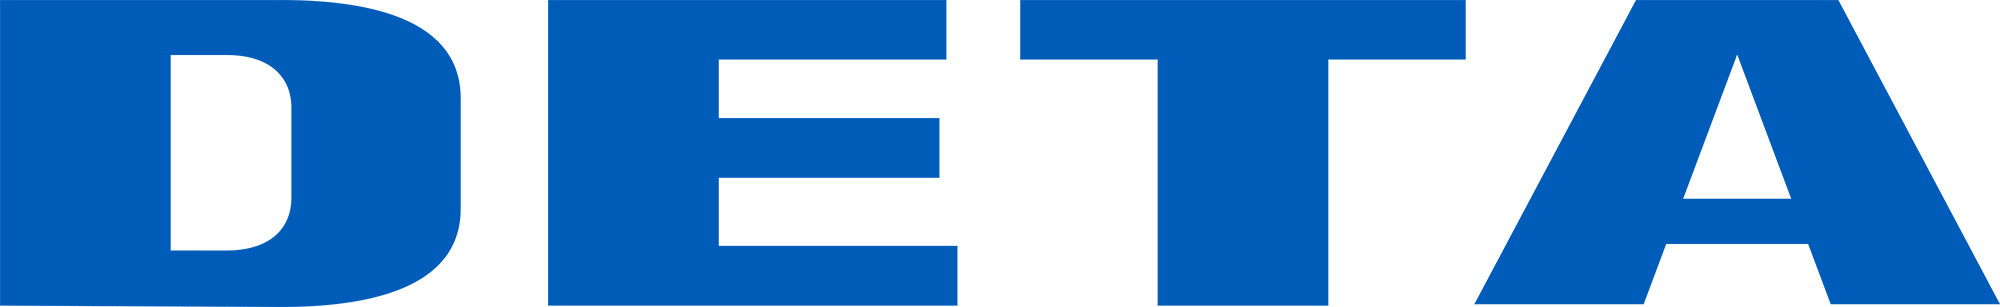 DETA_logo.jpg